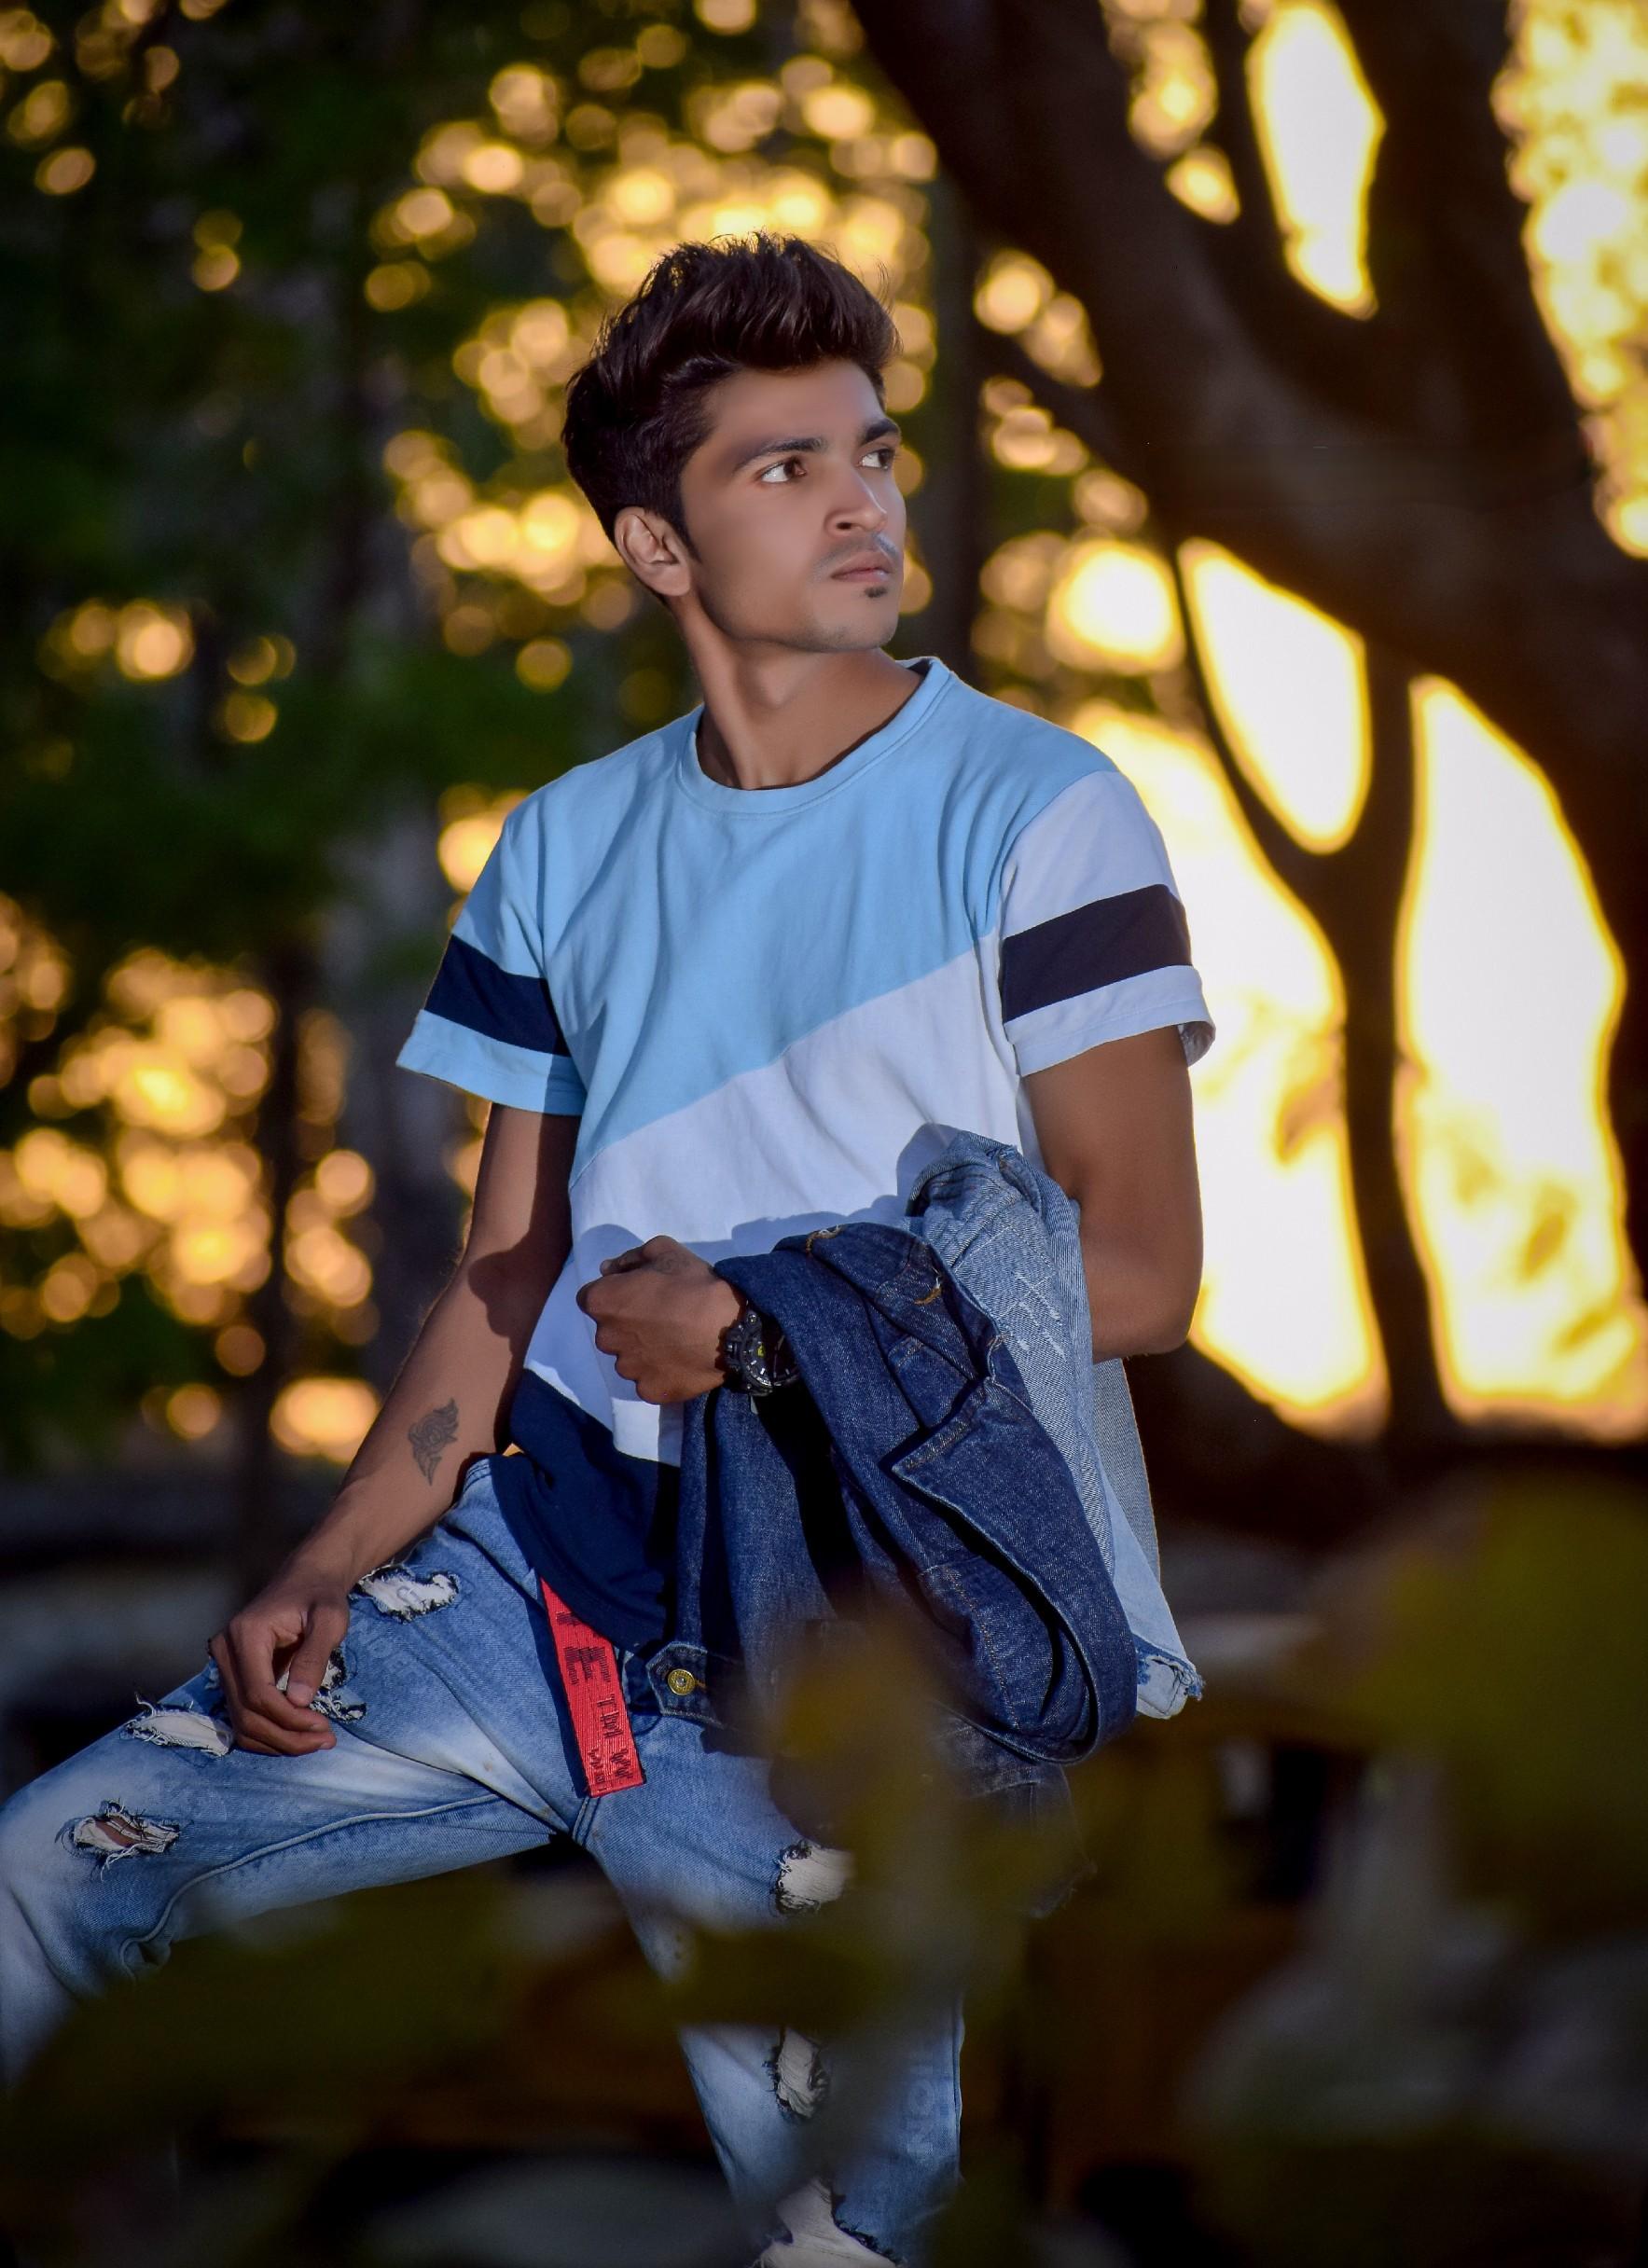 A male fashion model